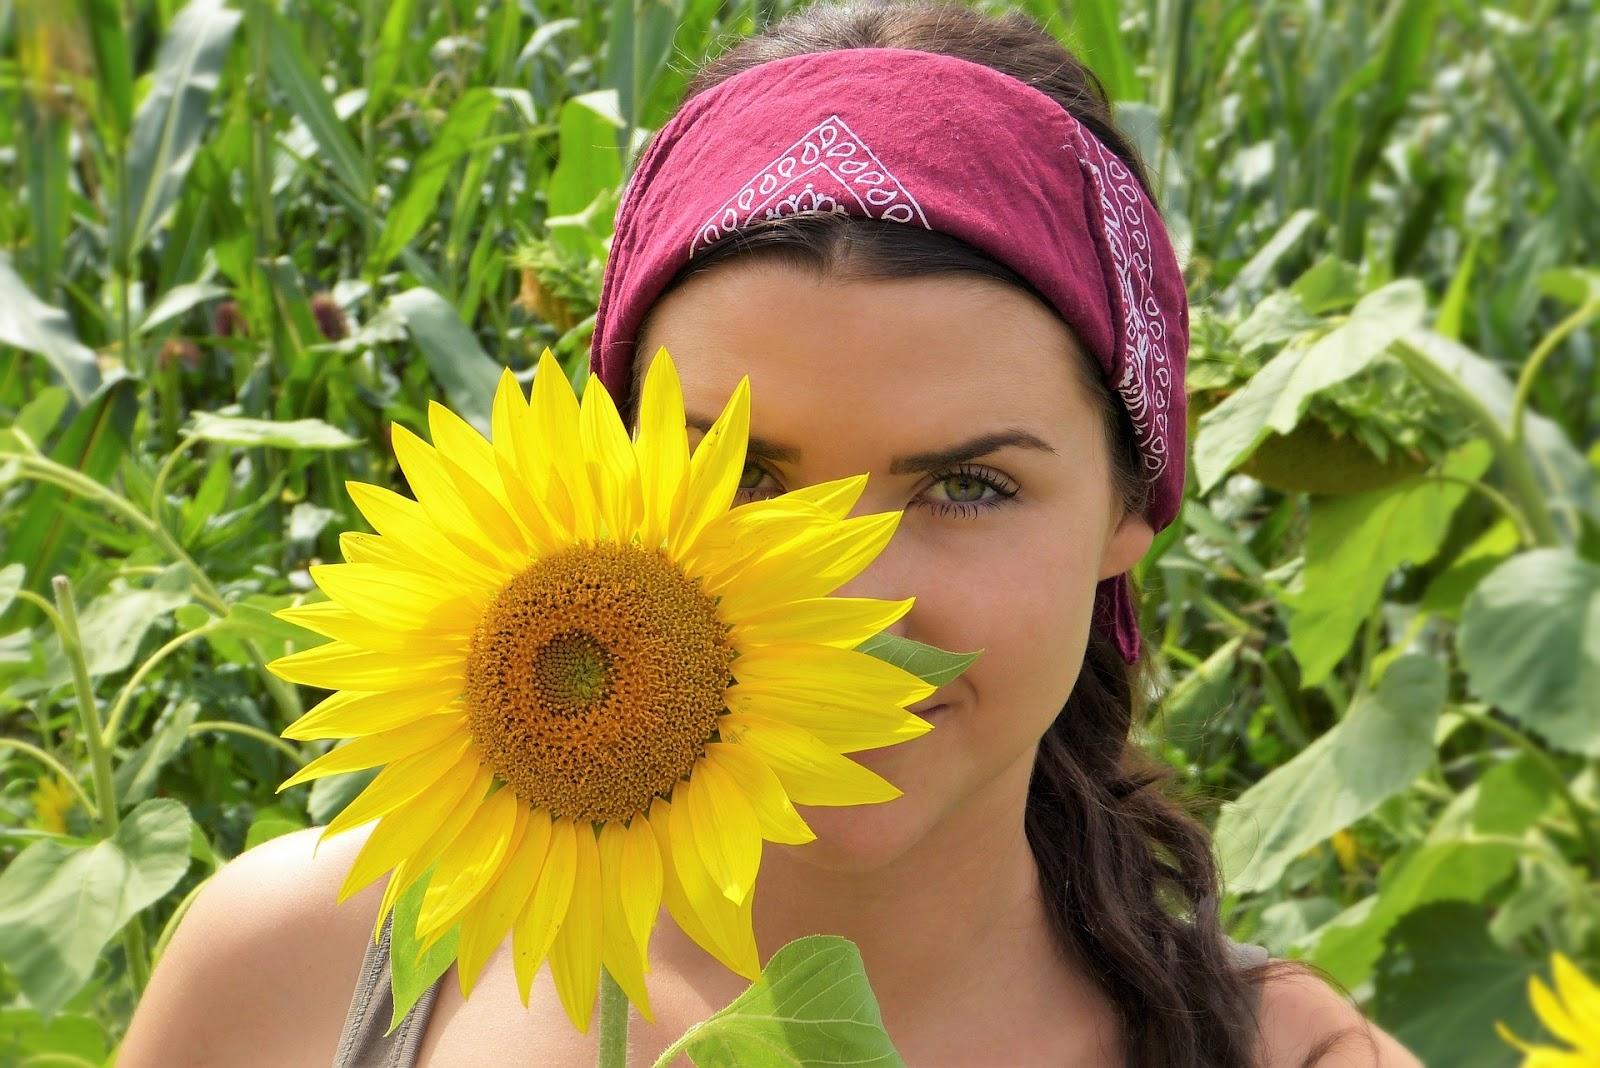 Woman peeking from behind sunflower blossom